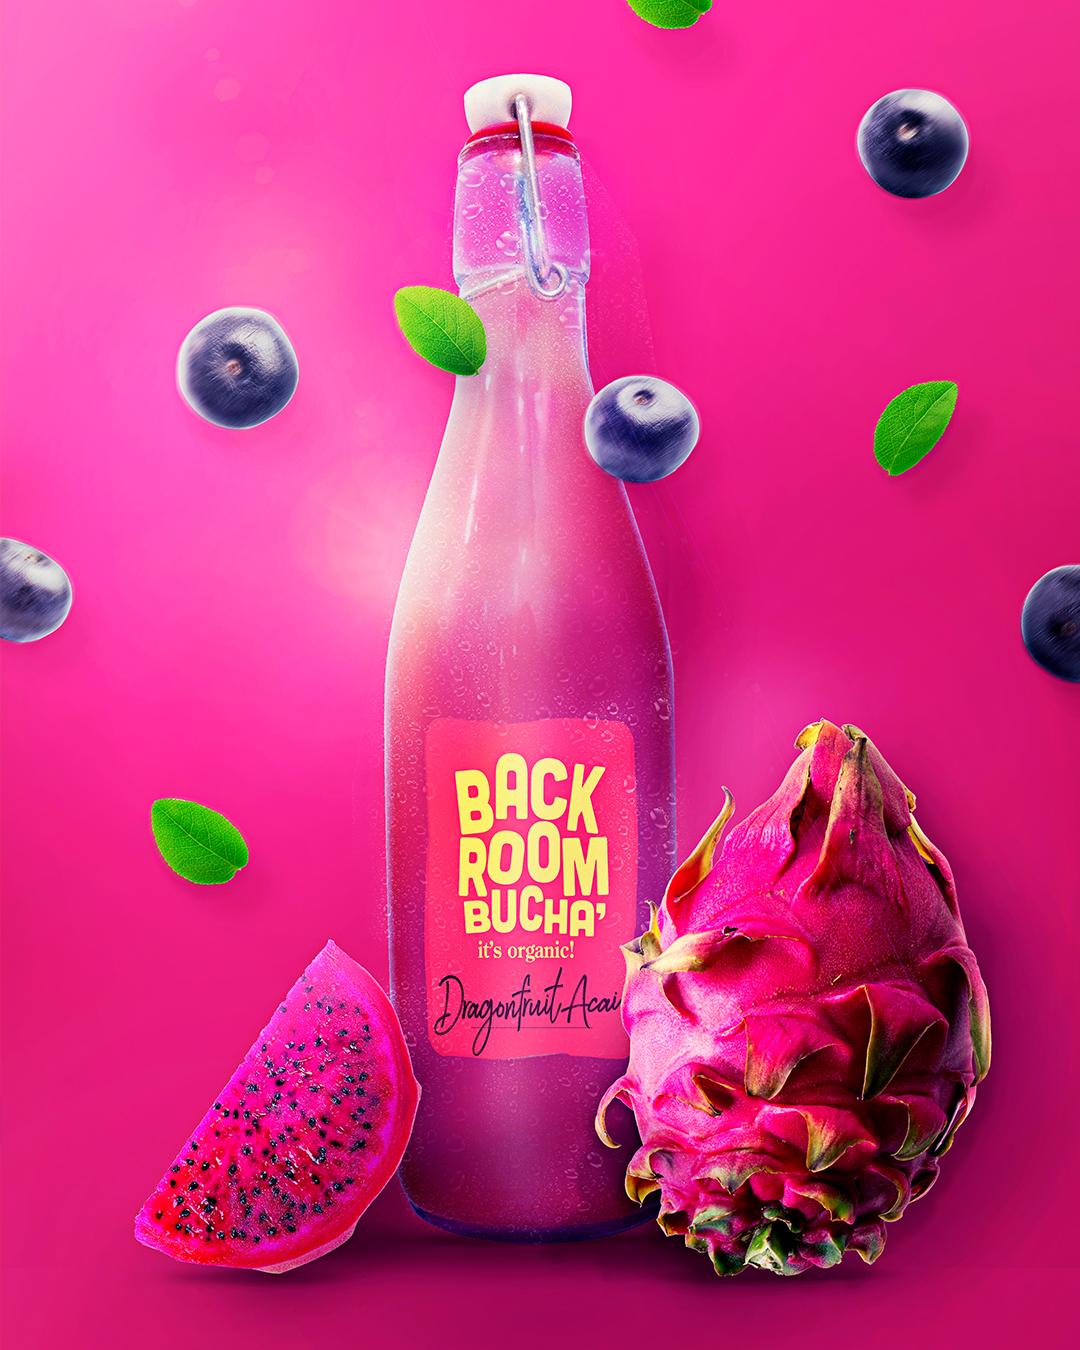 Back Room Bucha果汁包装设计